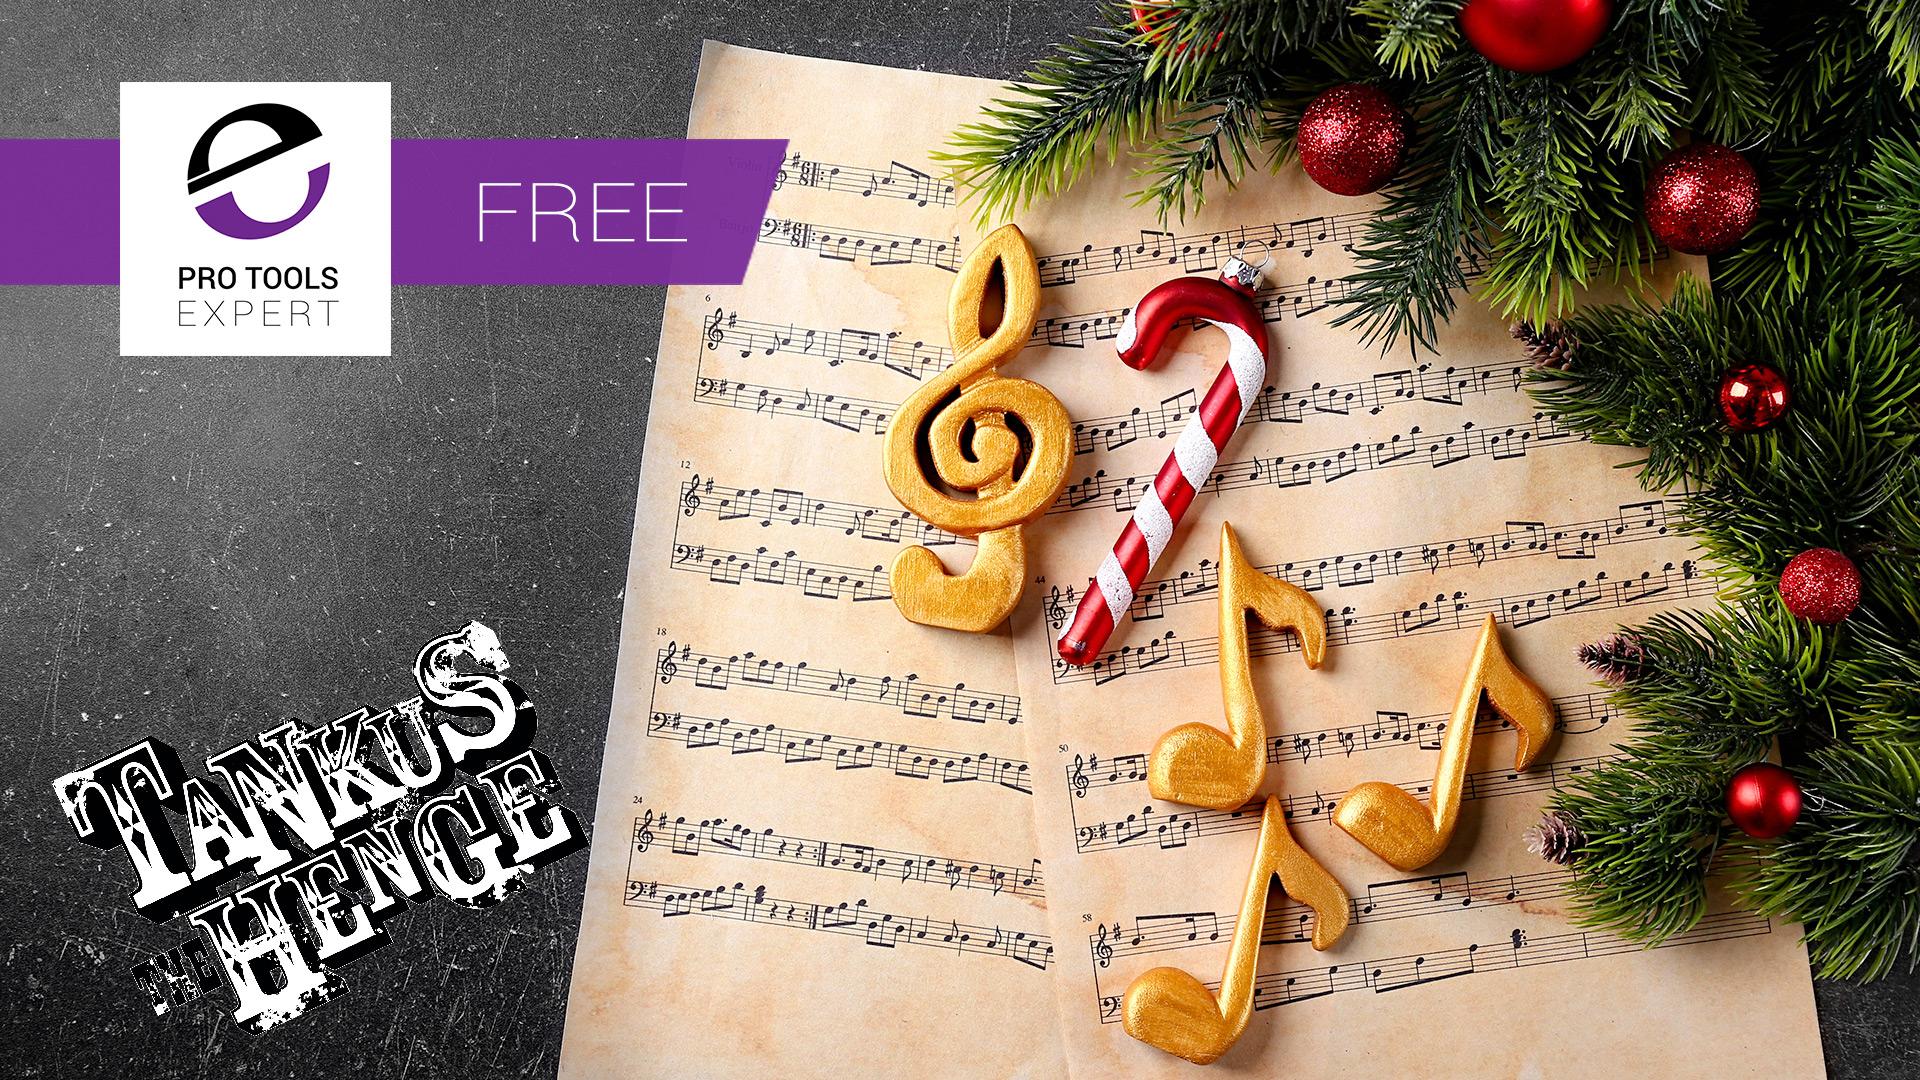 producing-christmas-song-music-free-download-tankus-the-henge.jpg